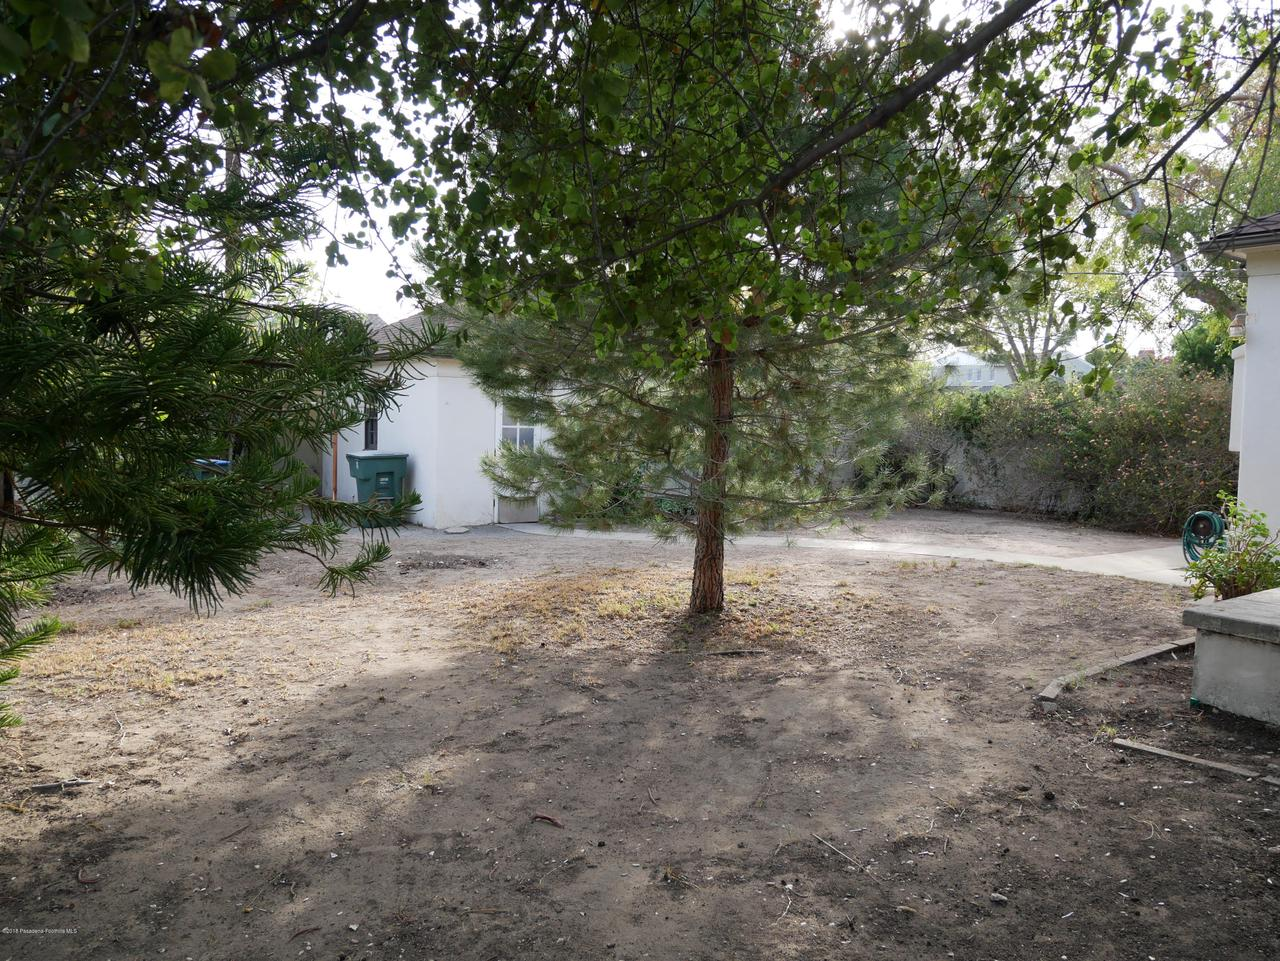 2432 ORANGE GROVE, Pasadena, CA 91104 - Back yard 2